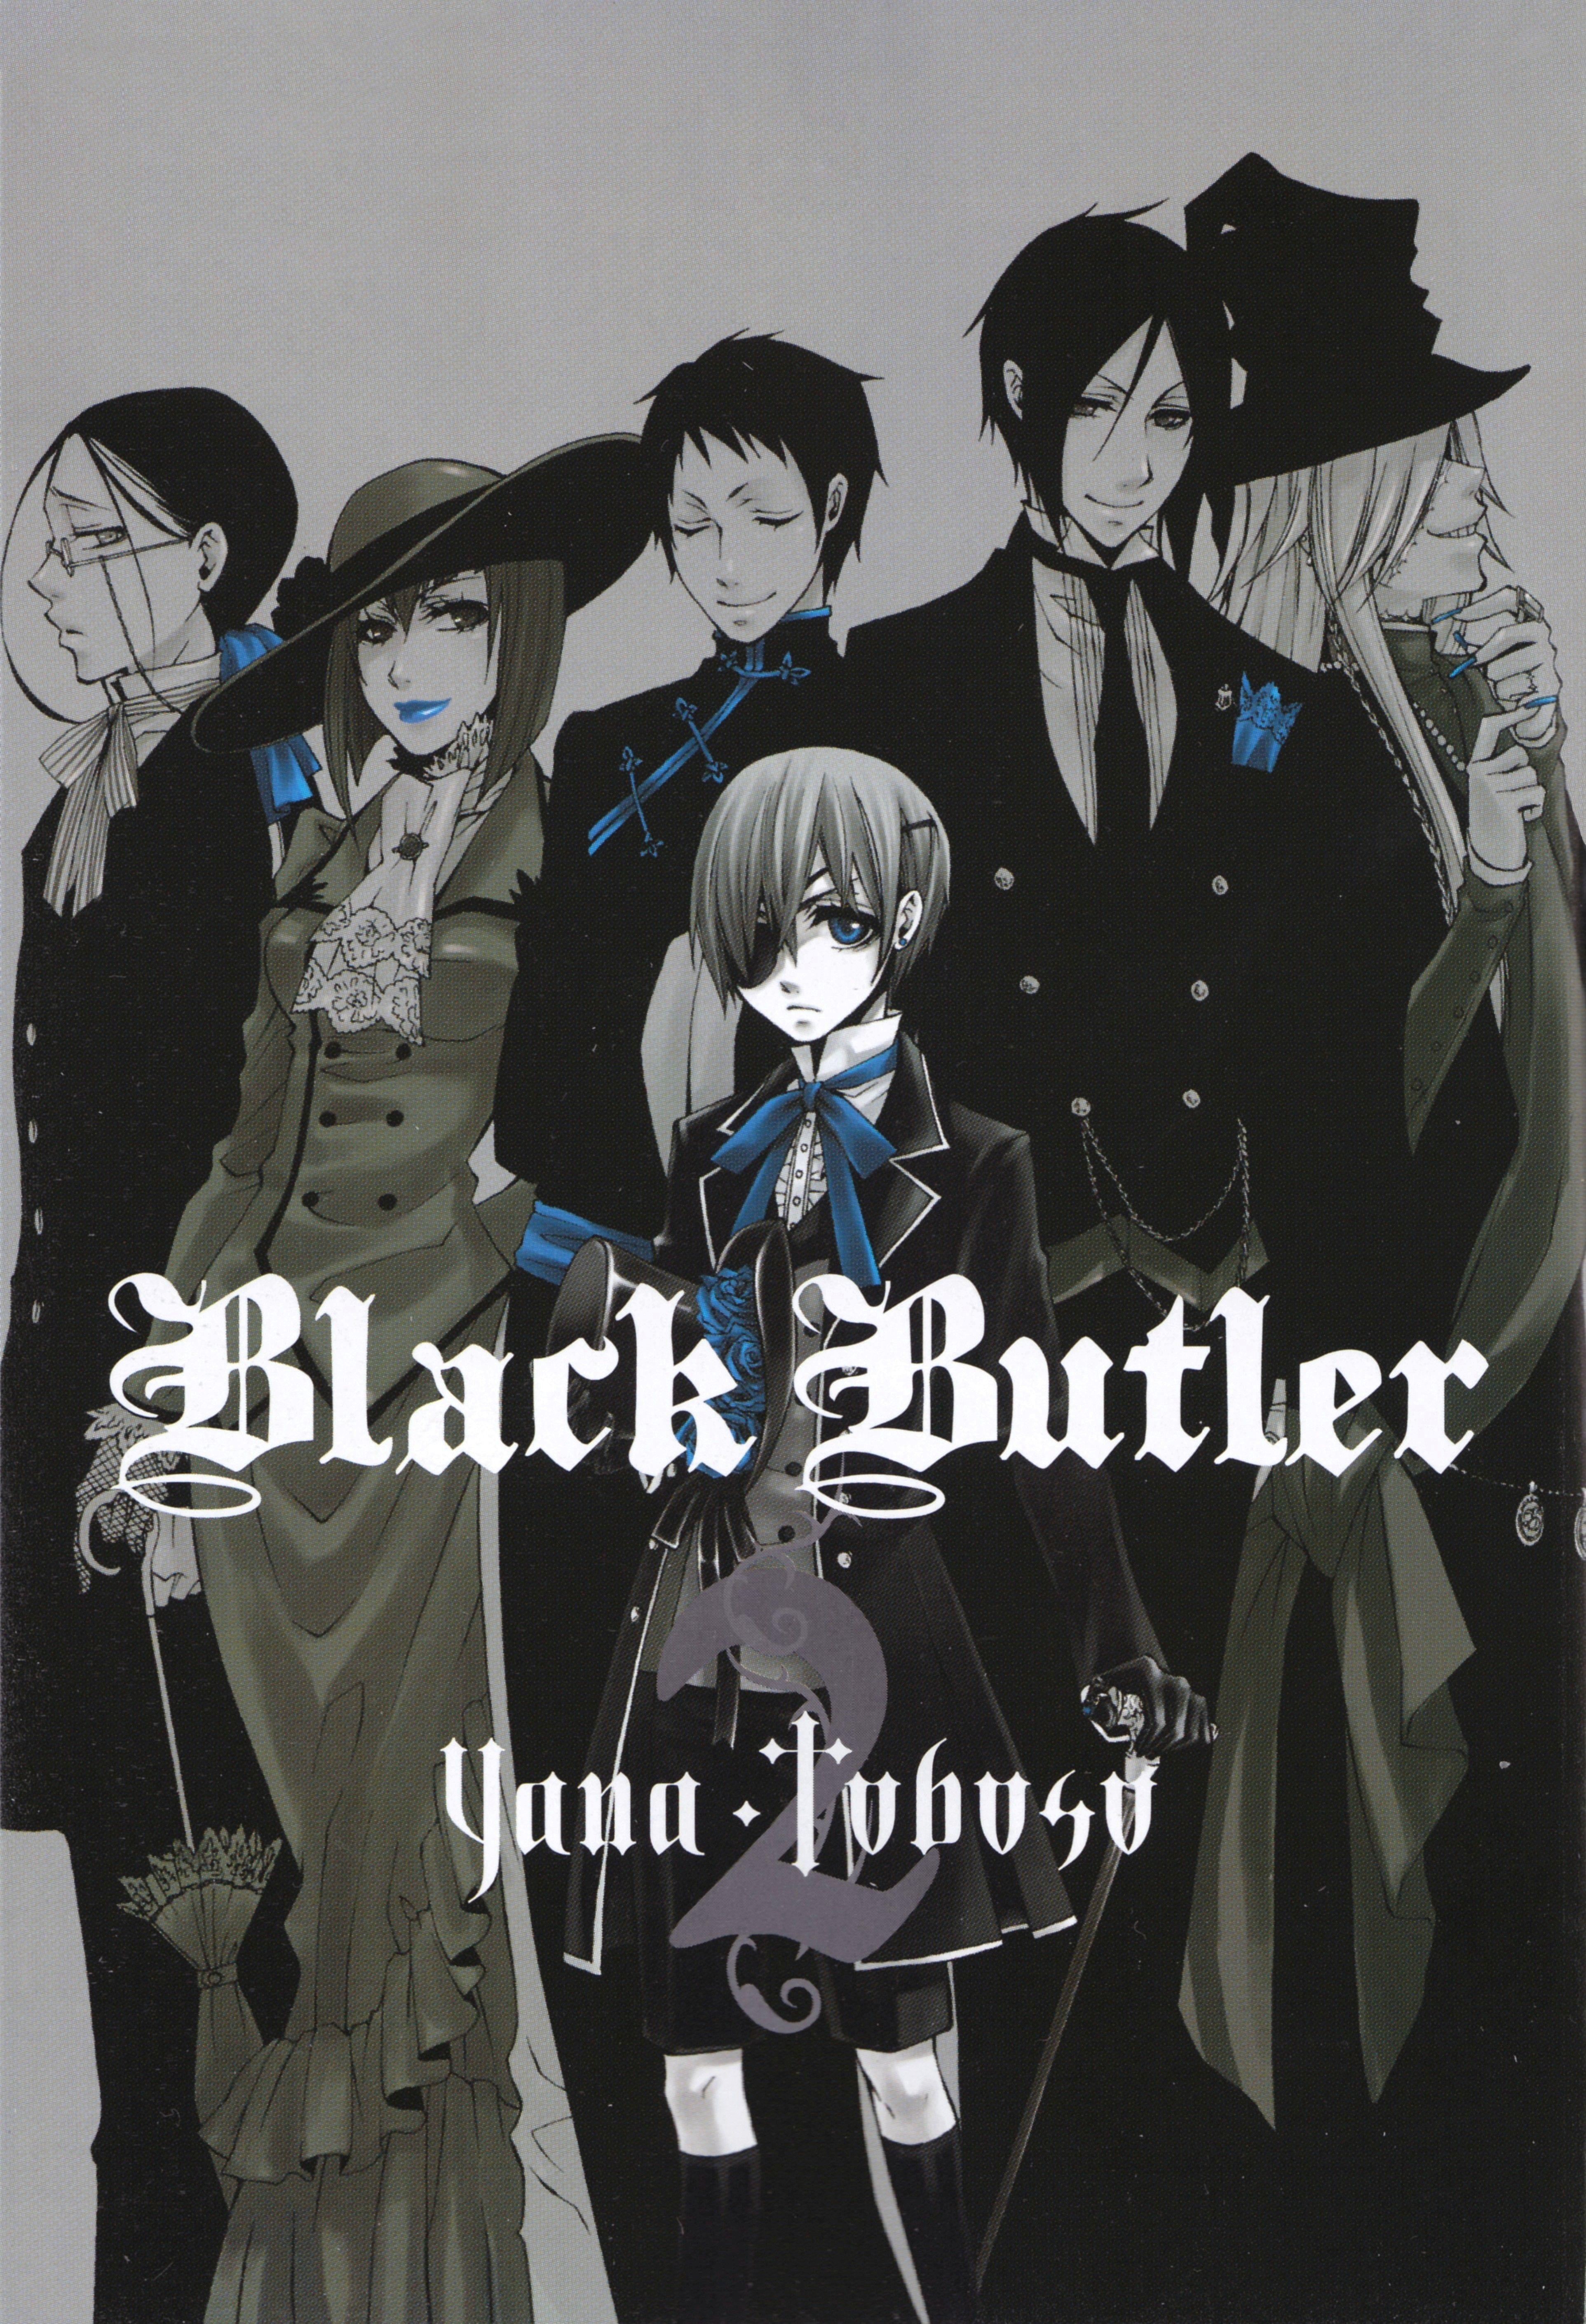 Kuroshitsuji iphone wallpaper tumblr - Kuroshitsuji Black Butler